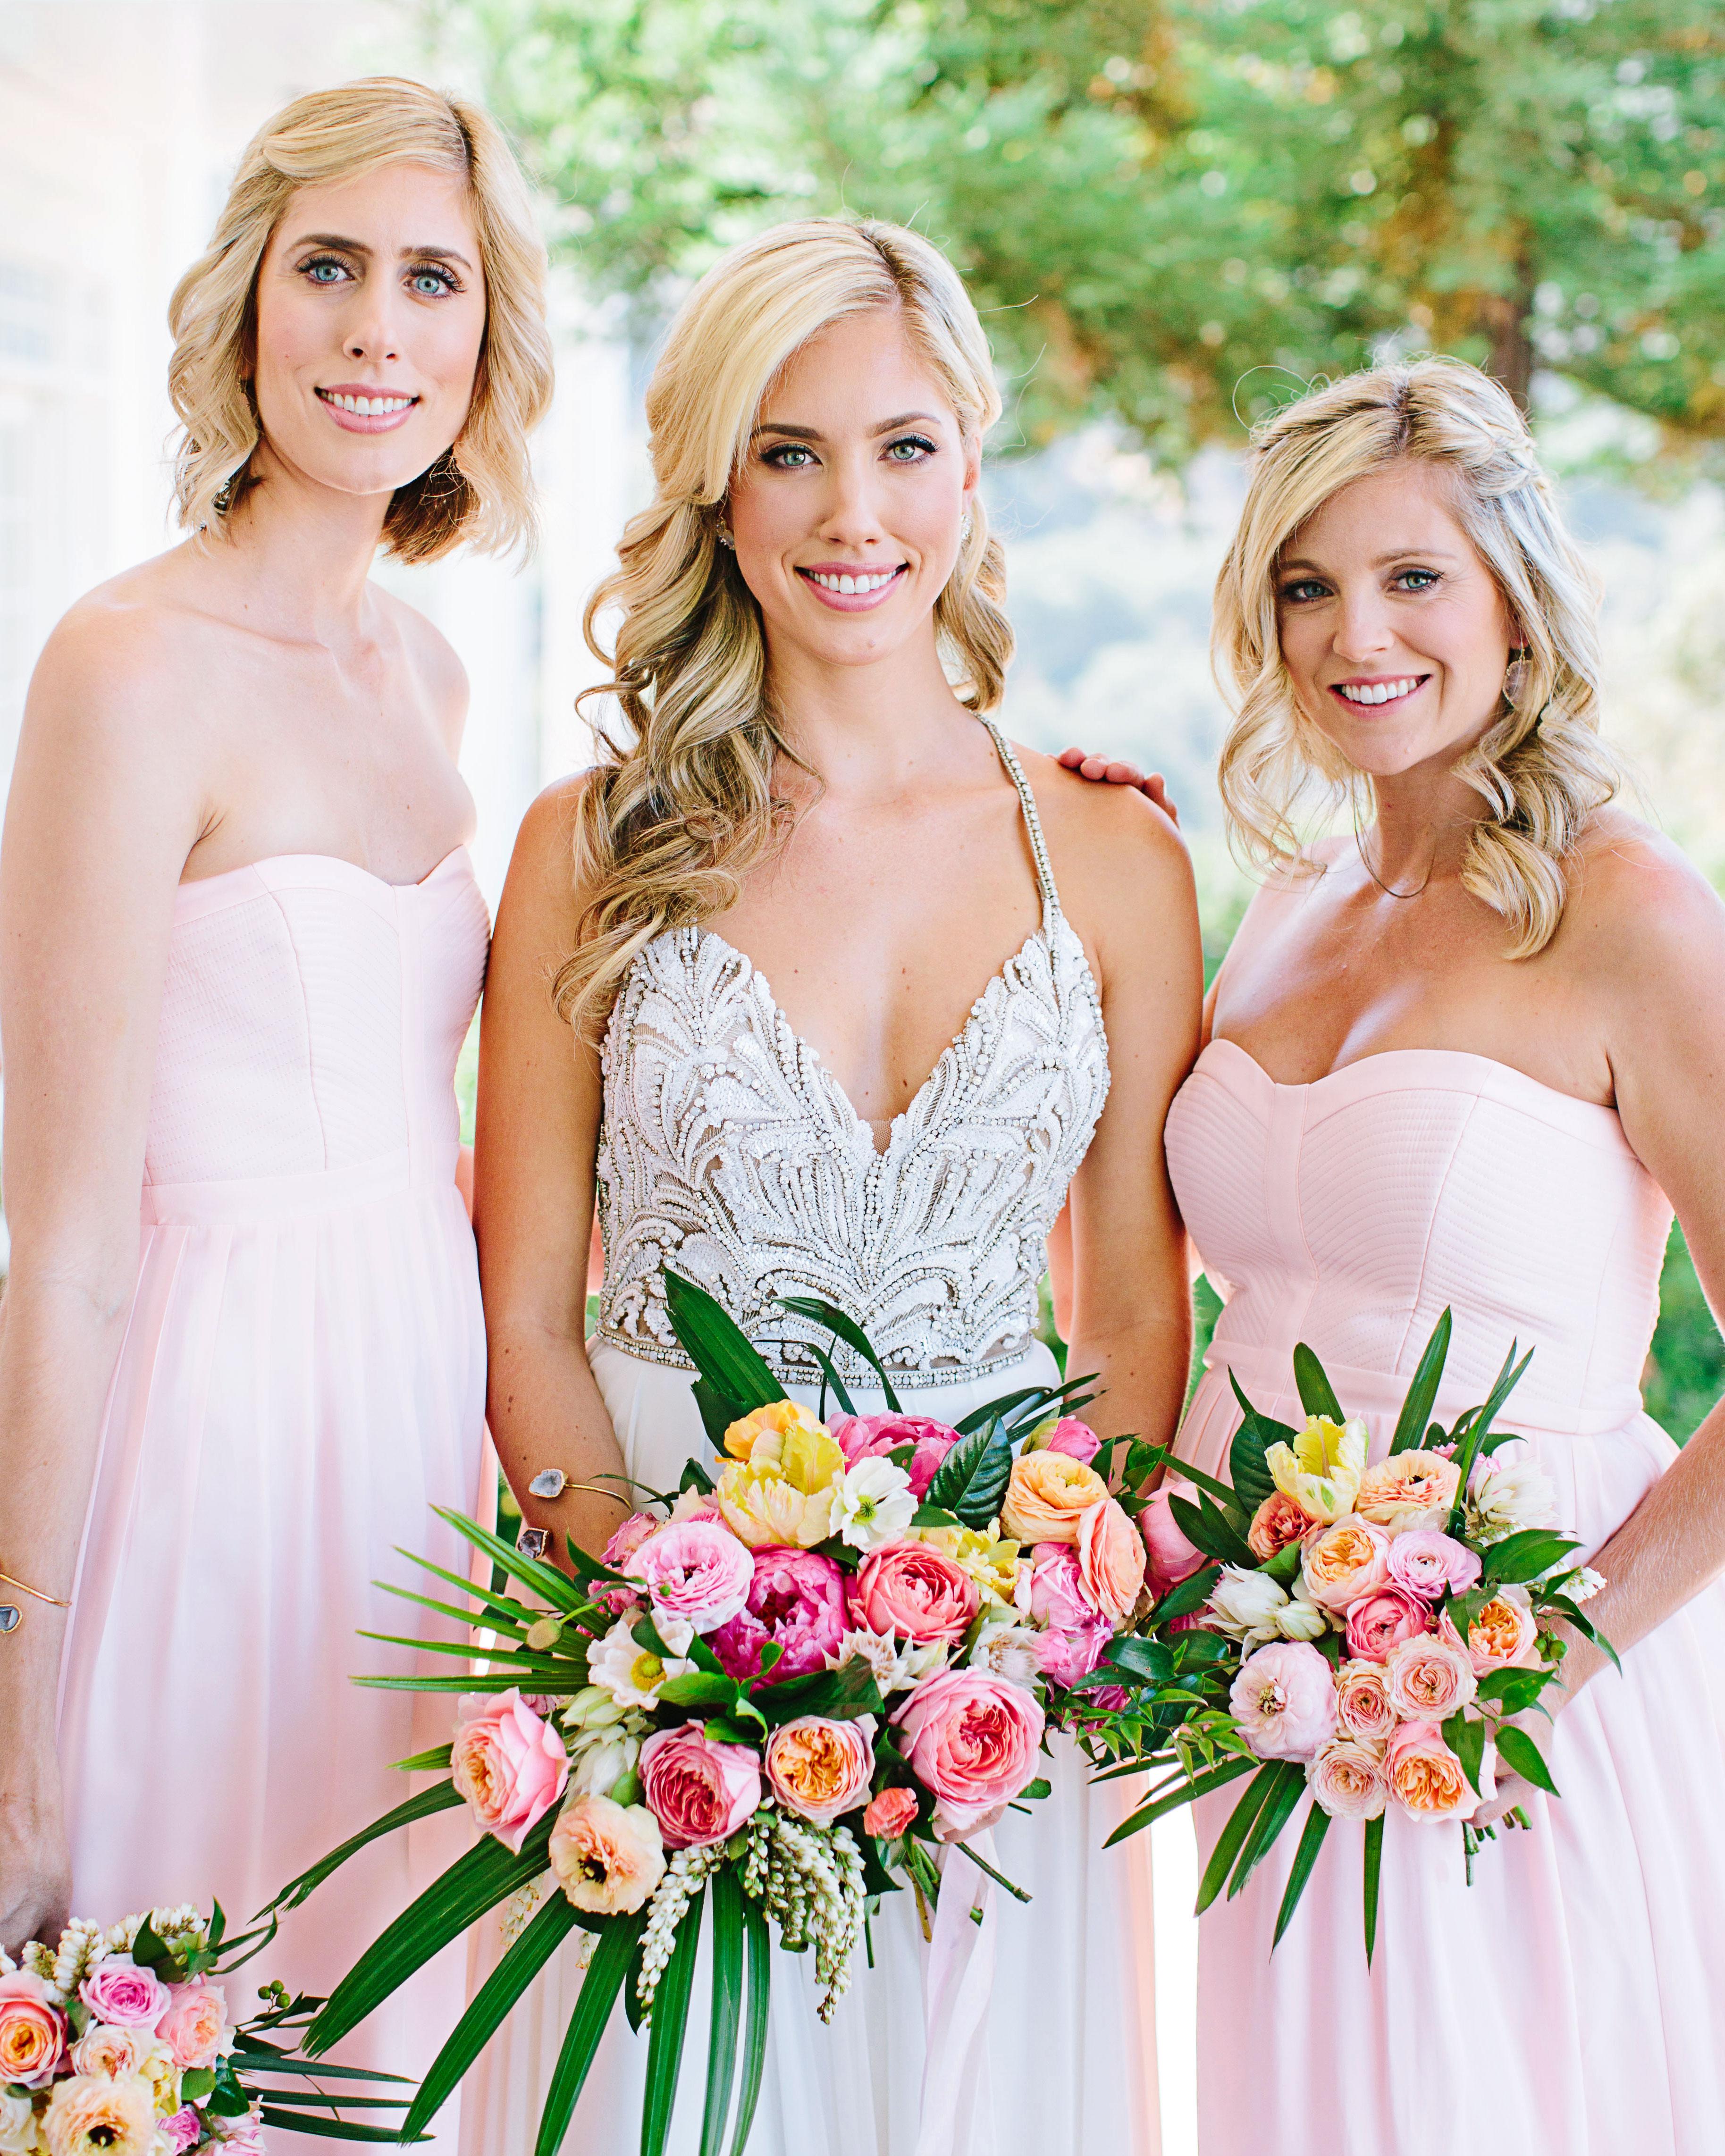 stephanie jared wedding bridesmaids